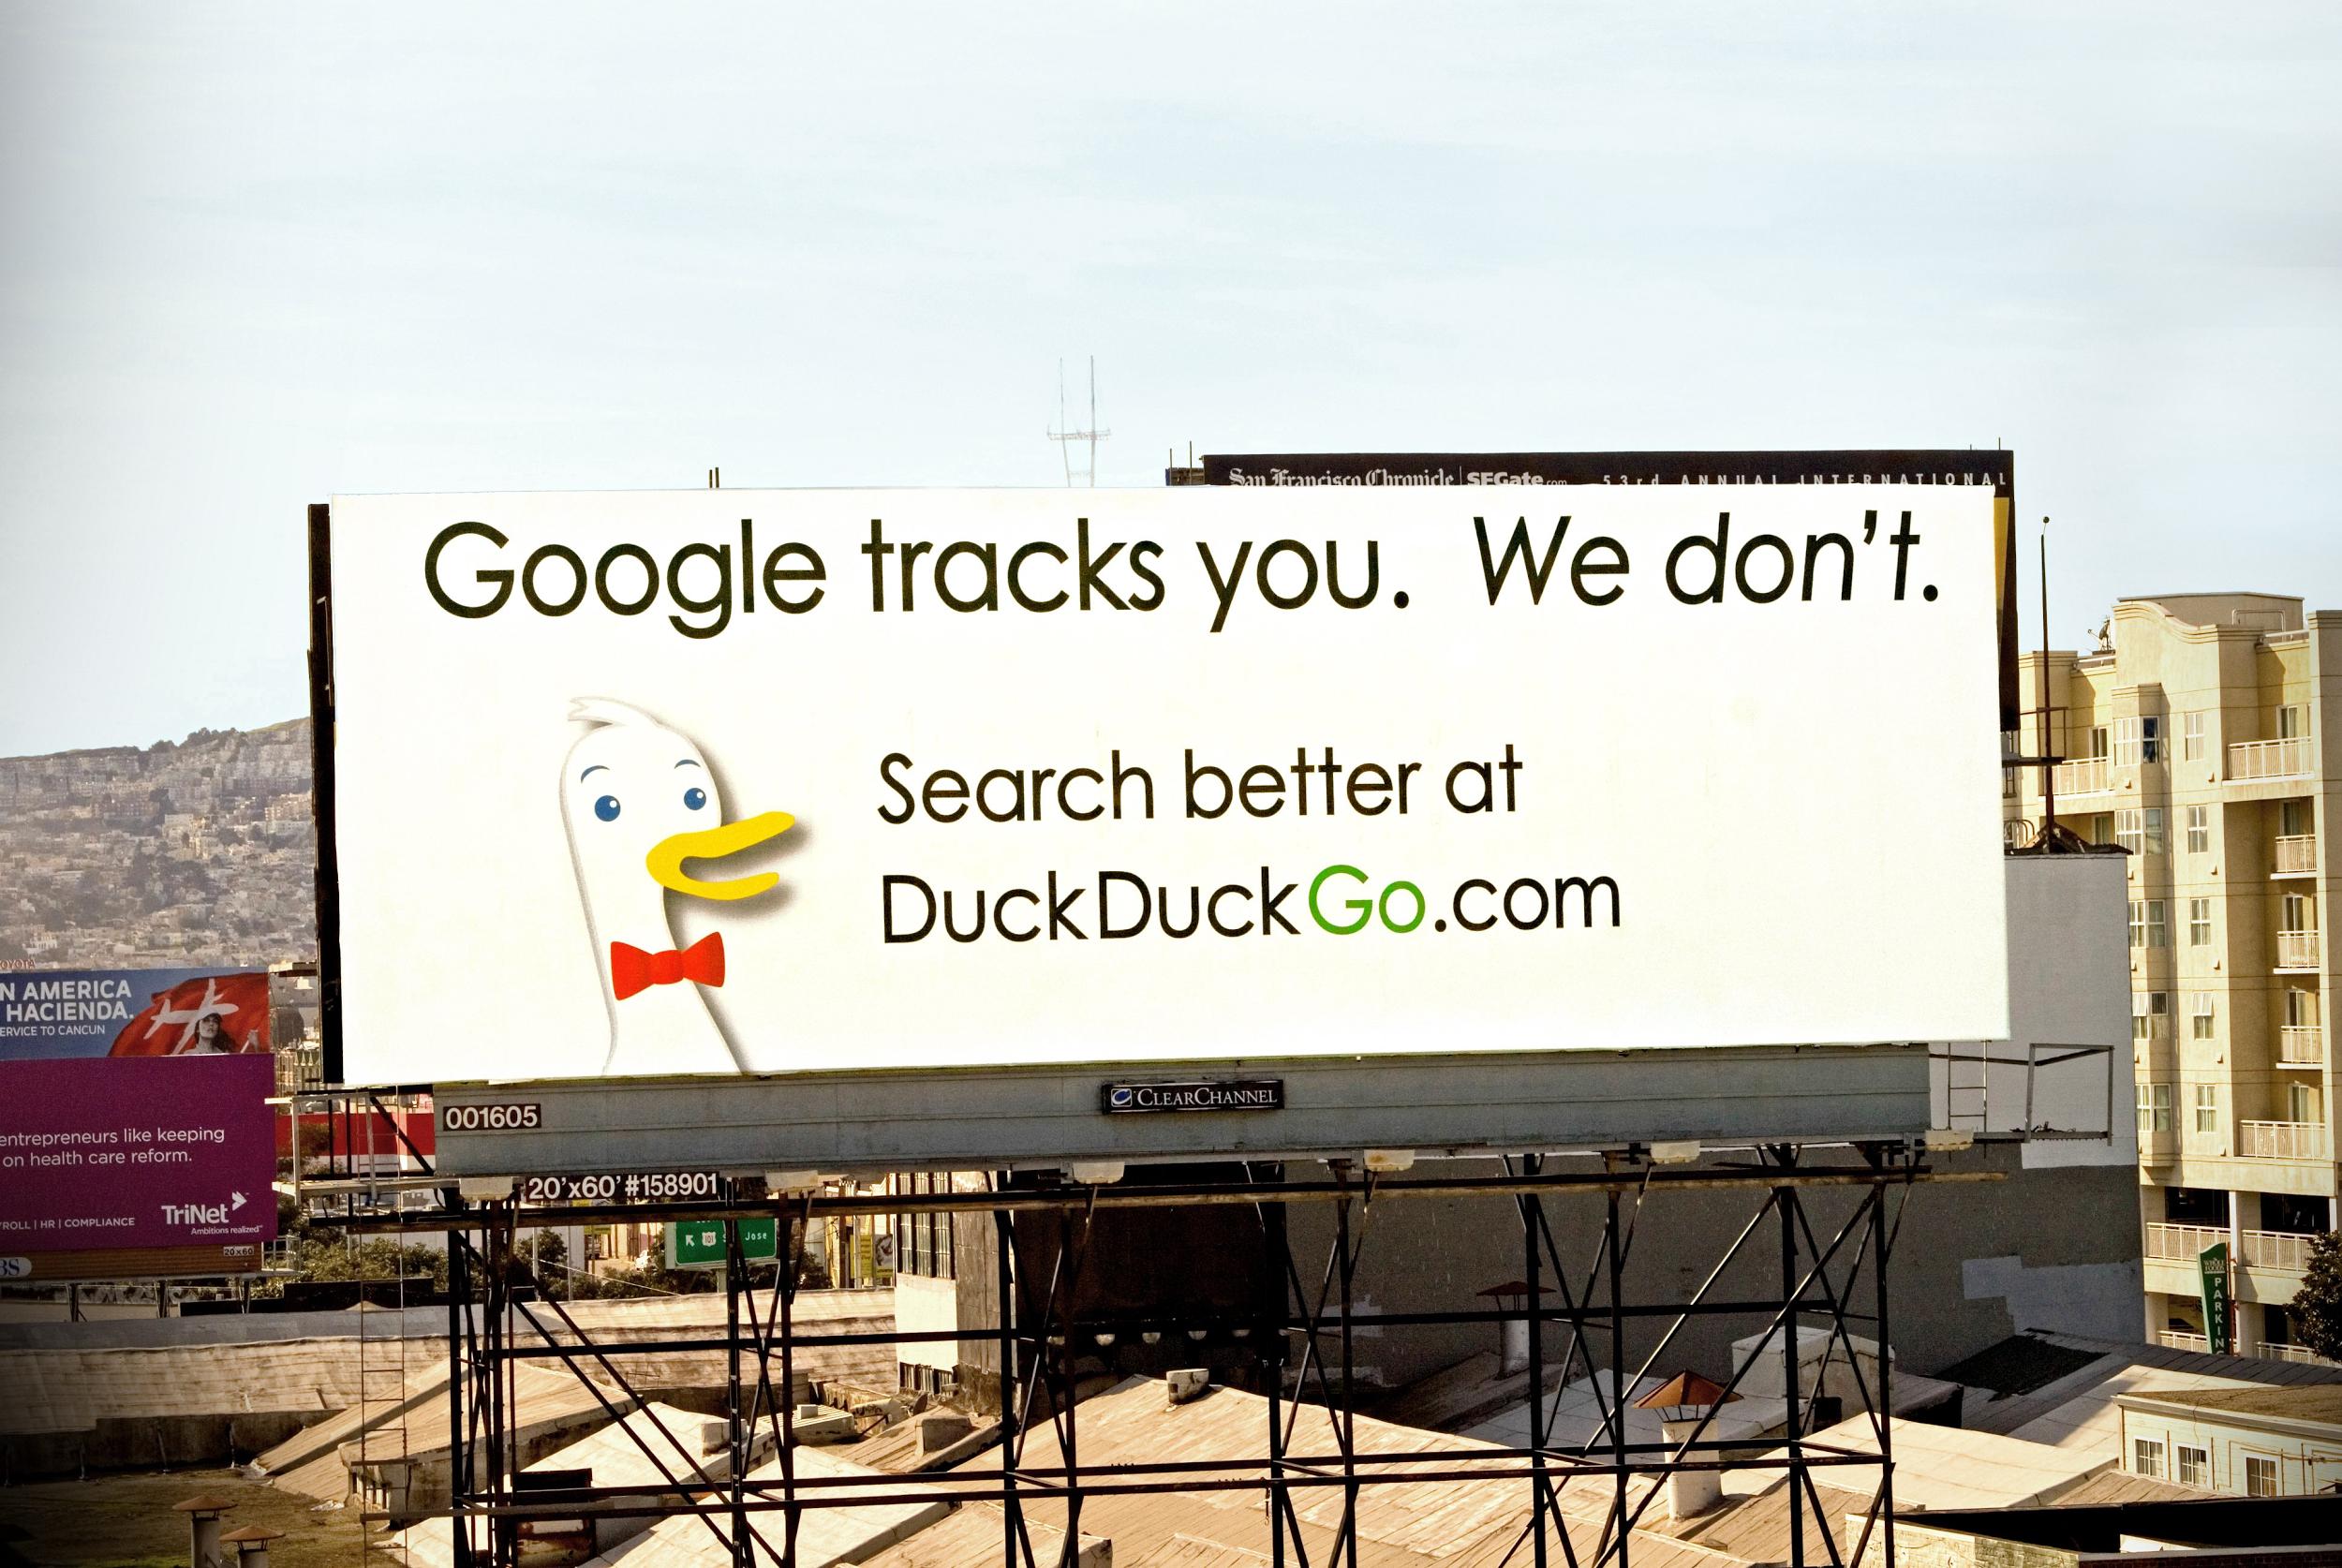 Screenshot showing a billboard for duckduckgo.com